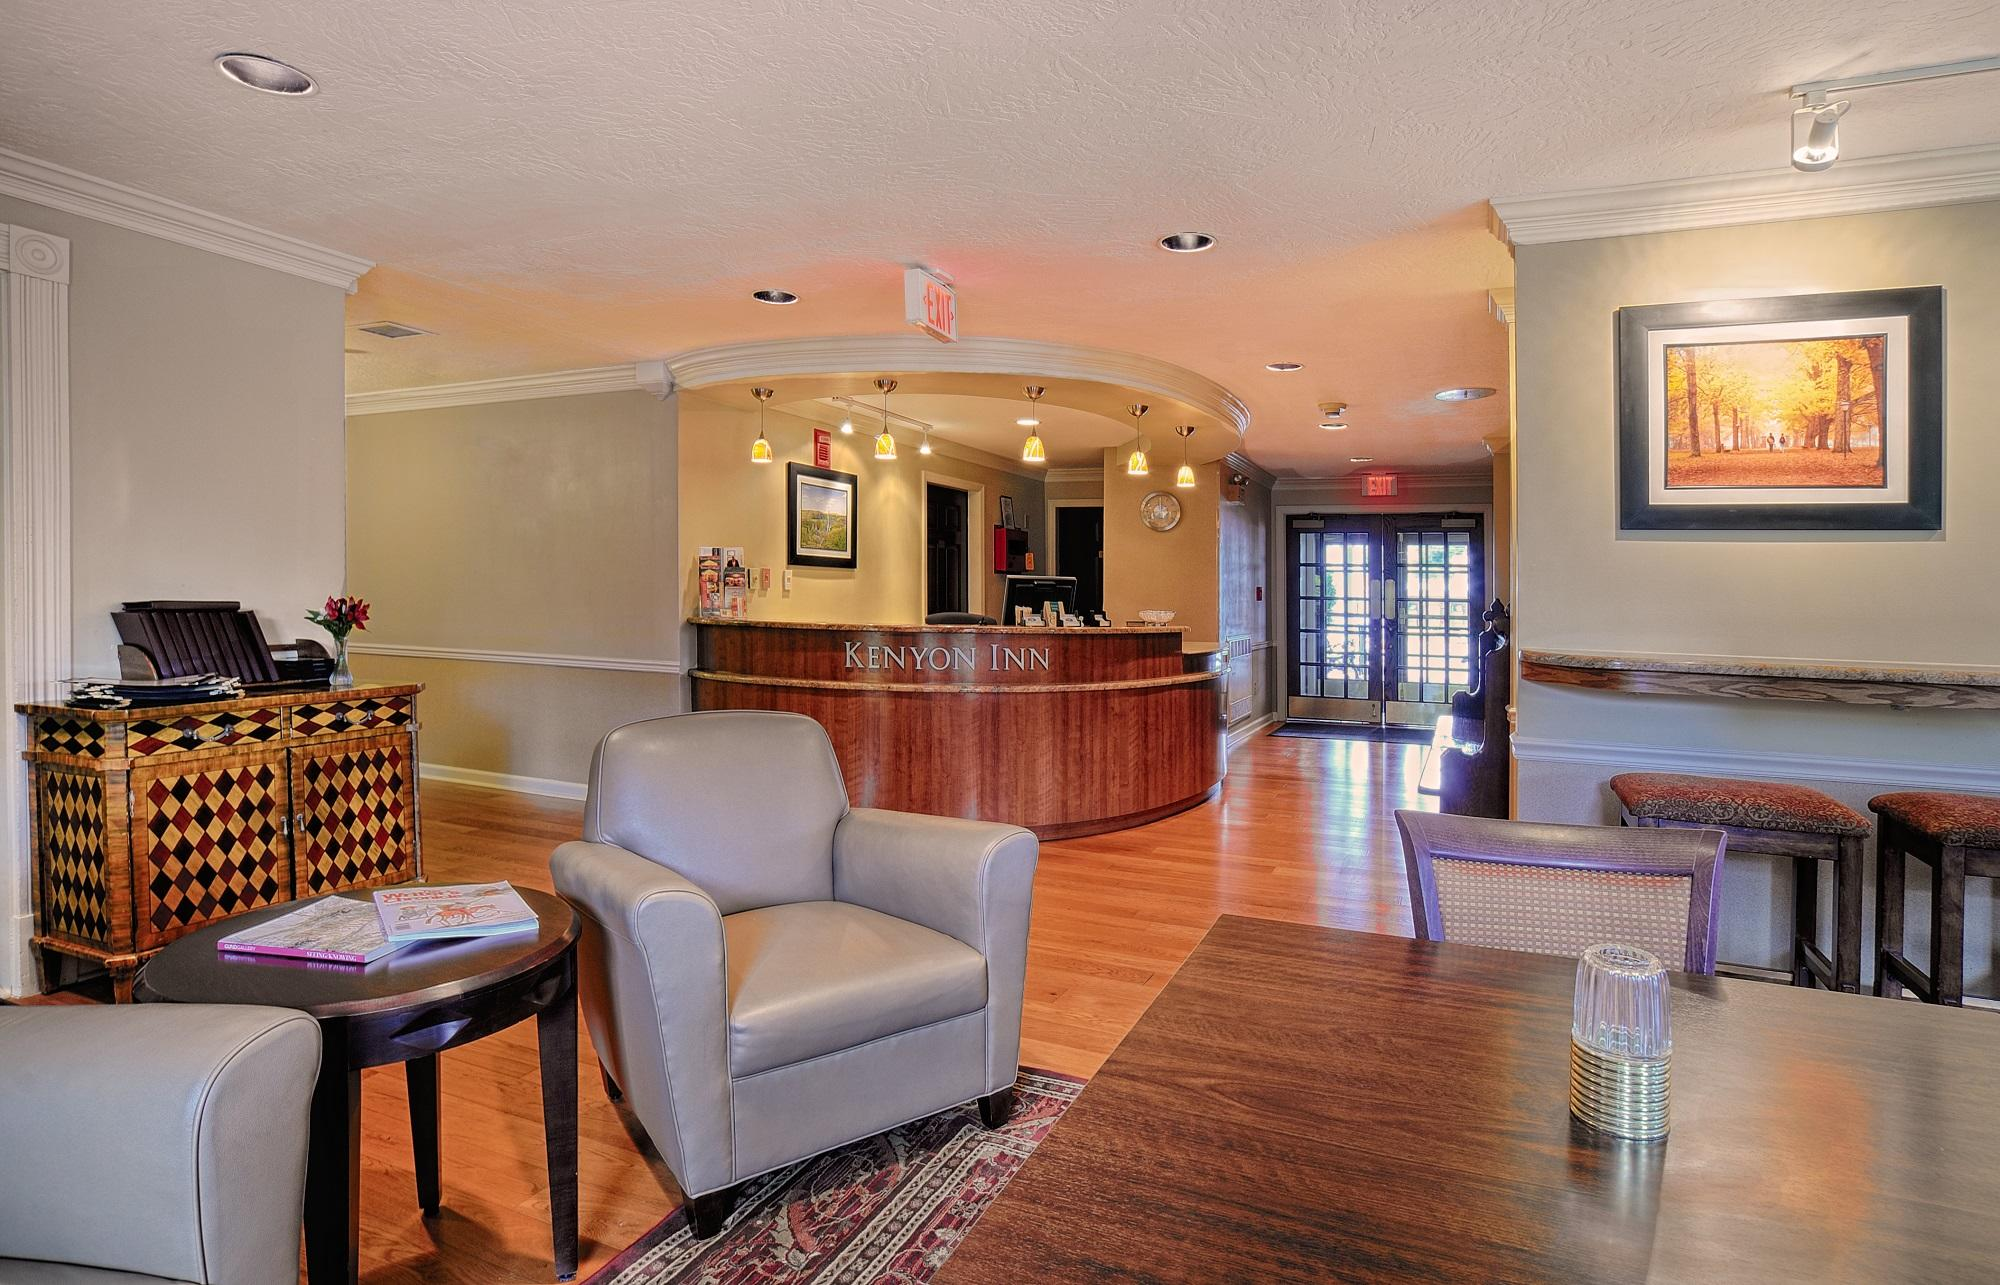 Kenyon Inn & Restaurant image 8